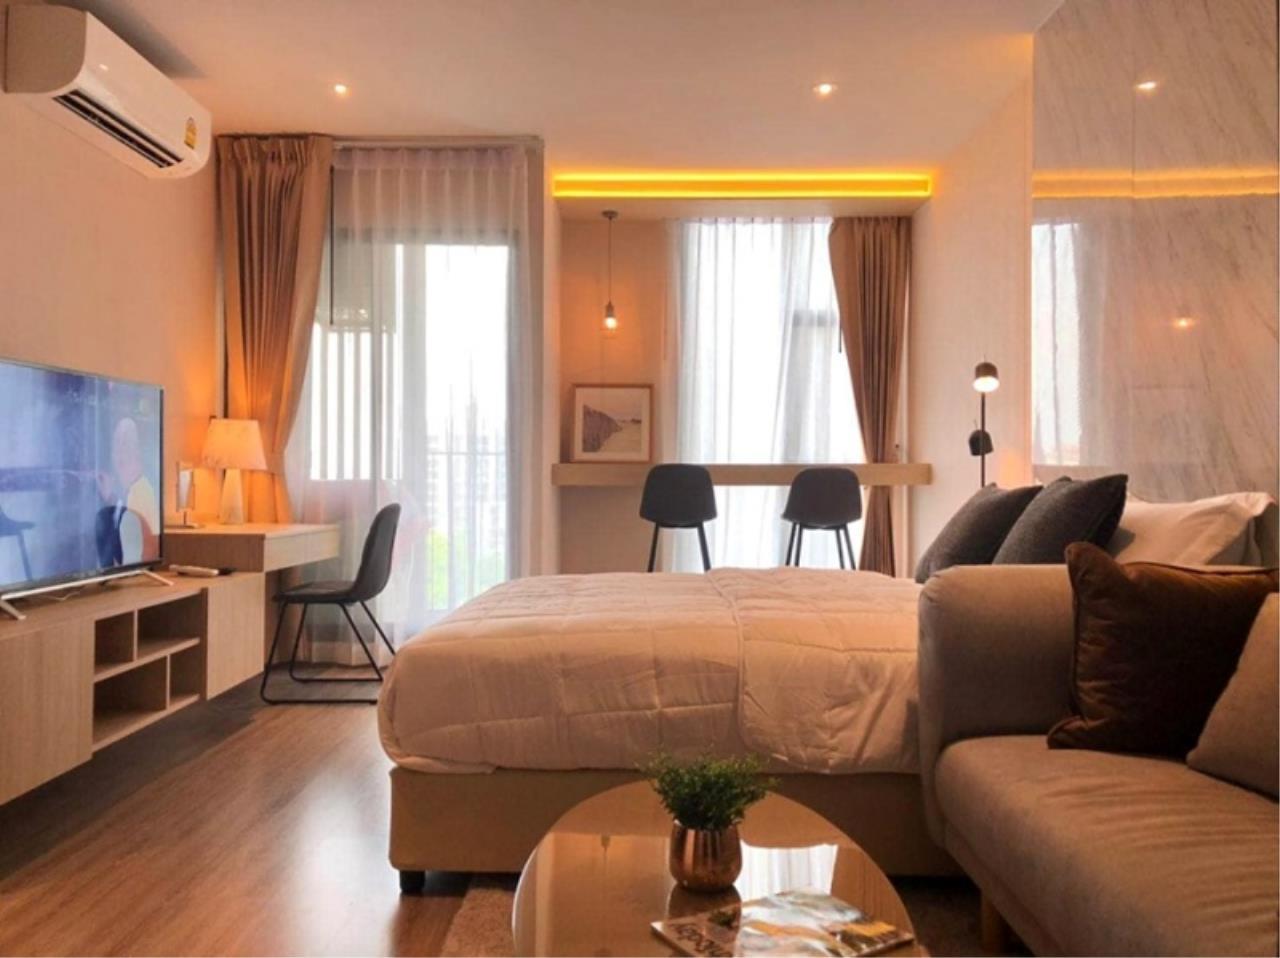 Century21 Skylux Agency's RHYTHM Ekkamai / Condo For Rent / 1 Bedroom / 31 SQM / BTS Ekkamai / Bangkok 2